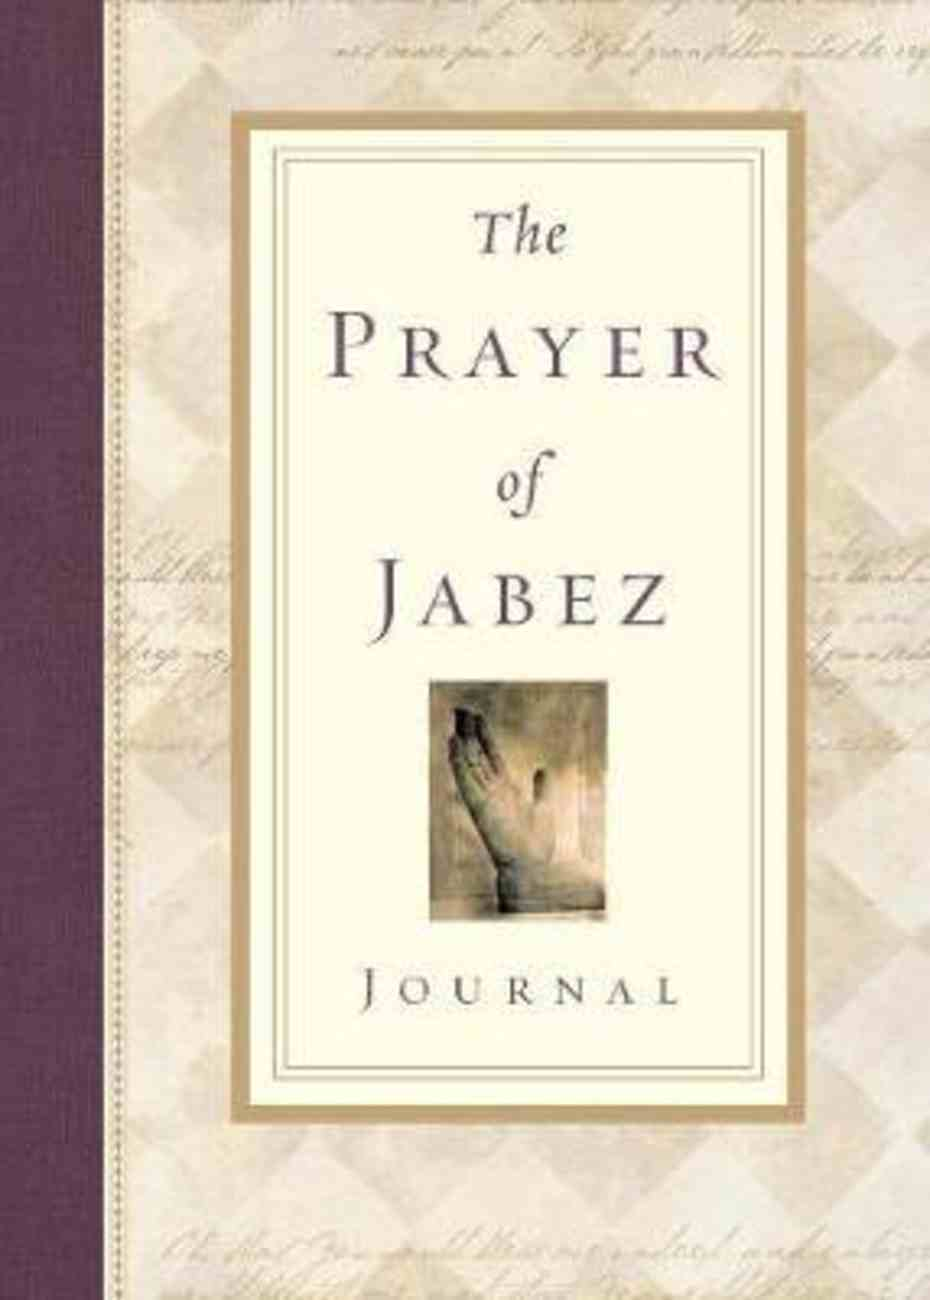 The Prayer of Jabez (Journal) Paperback